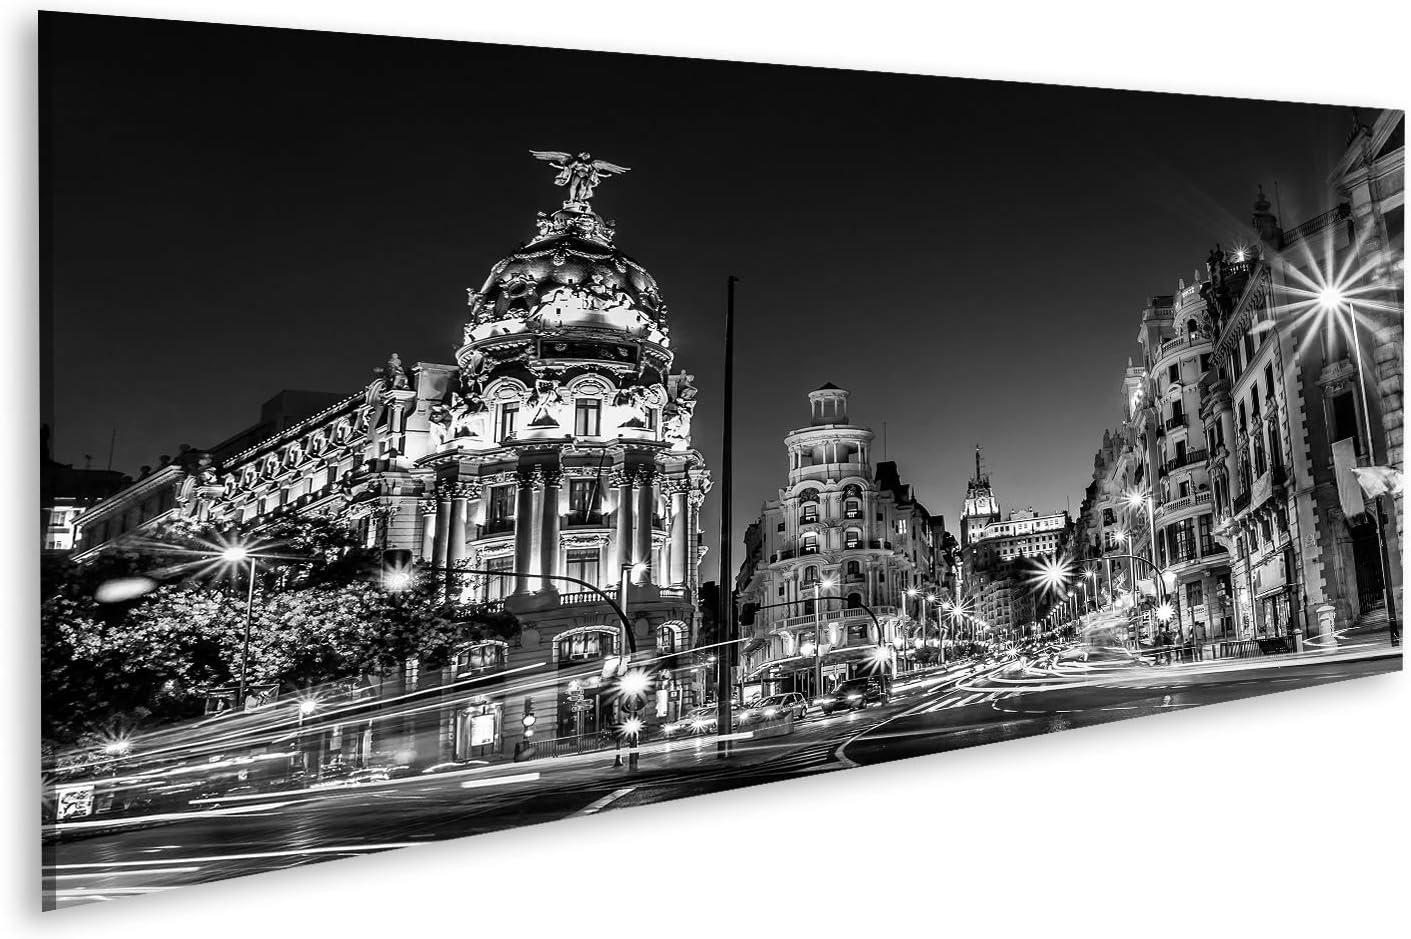 Cuadros de Salon Rayos de semáforos en la Calle Gran Vía, Principal Calle Comercial de Madrid de Noche España, Europa Cuadro Decoracion de Pared Impresión en Lienzo Formato Grande Modernos OQL-Pano-N